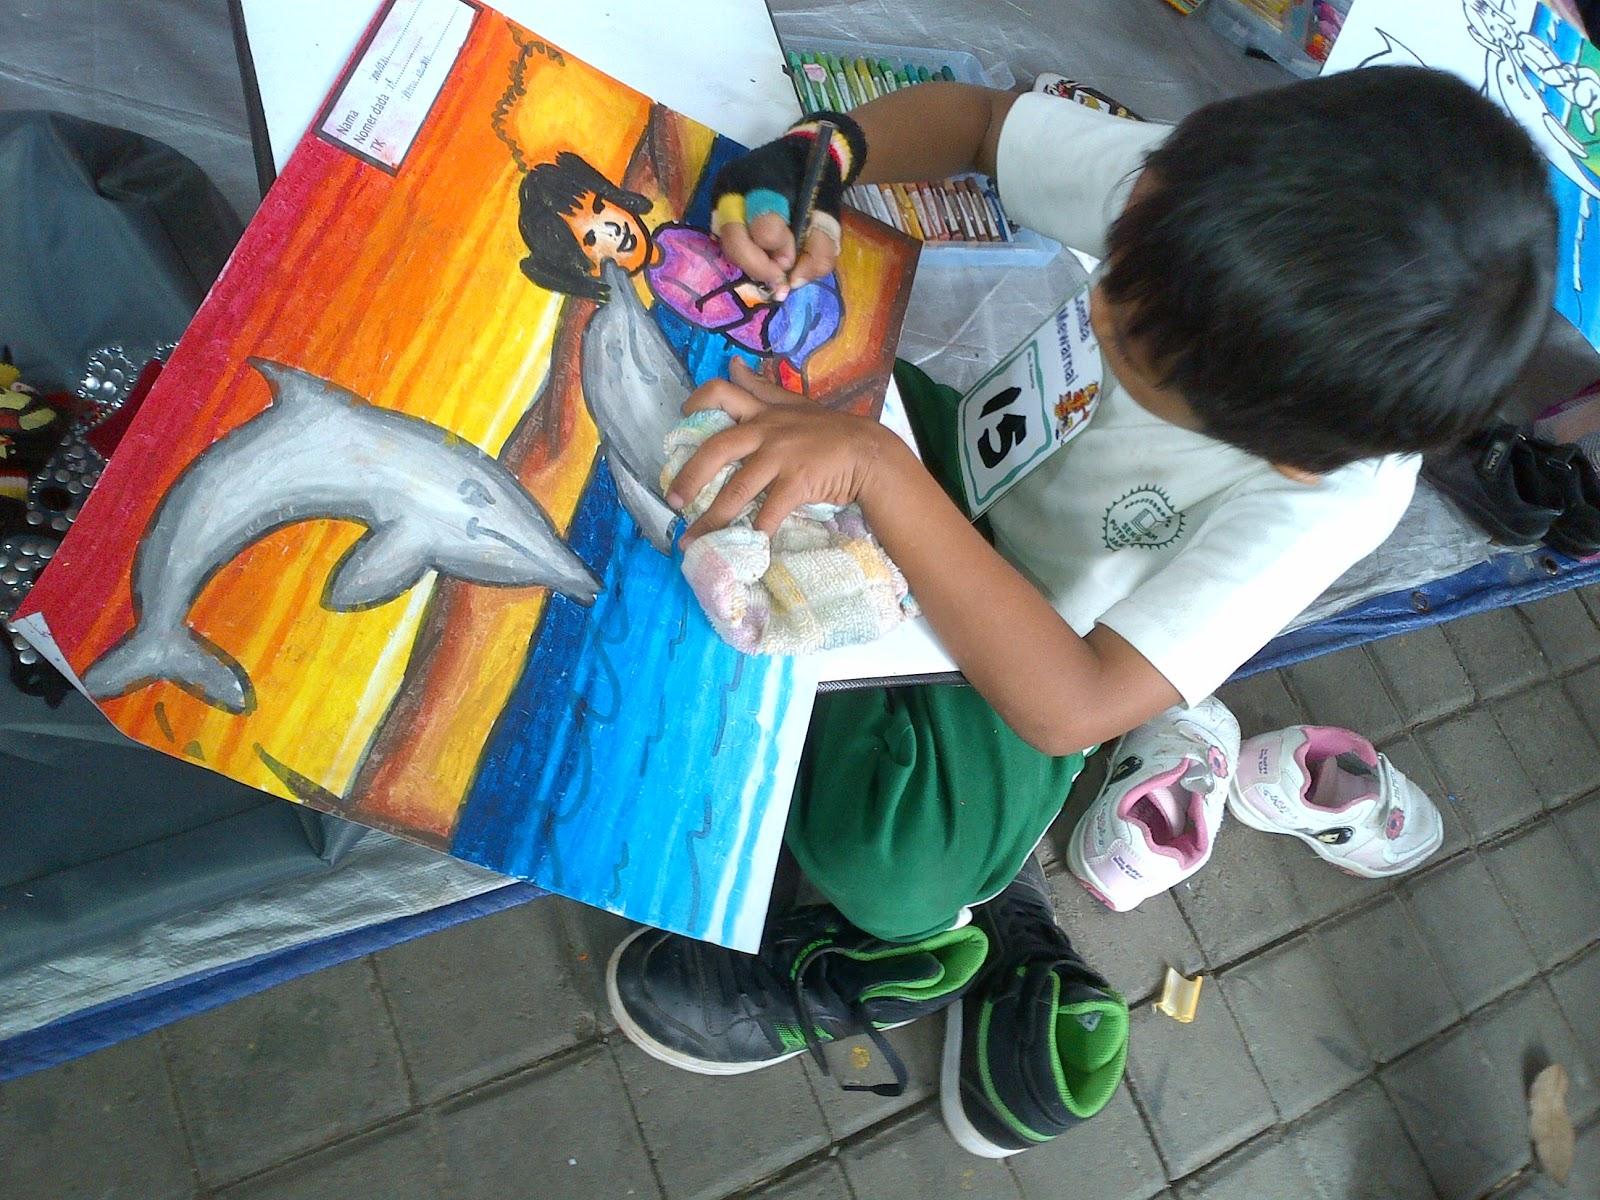 Selesai mewarnai kita melihat2 para peserta melukis Dan ternyata peserta lukis yg saingannya berat bgt wow hasil2 mereka